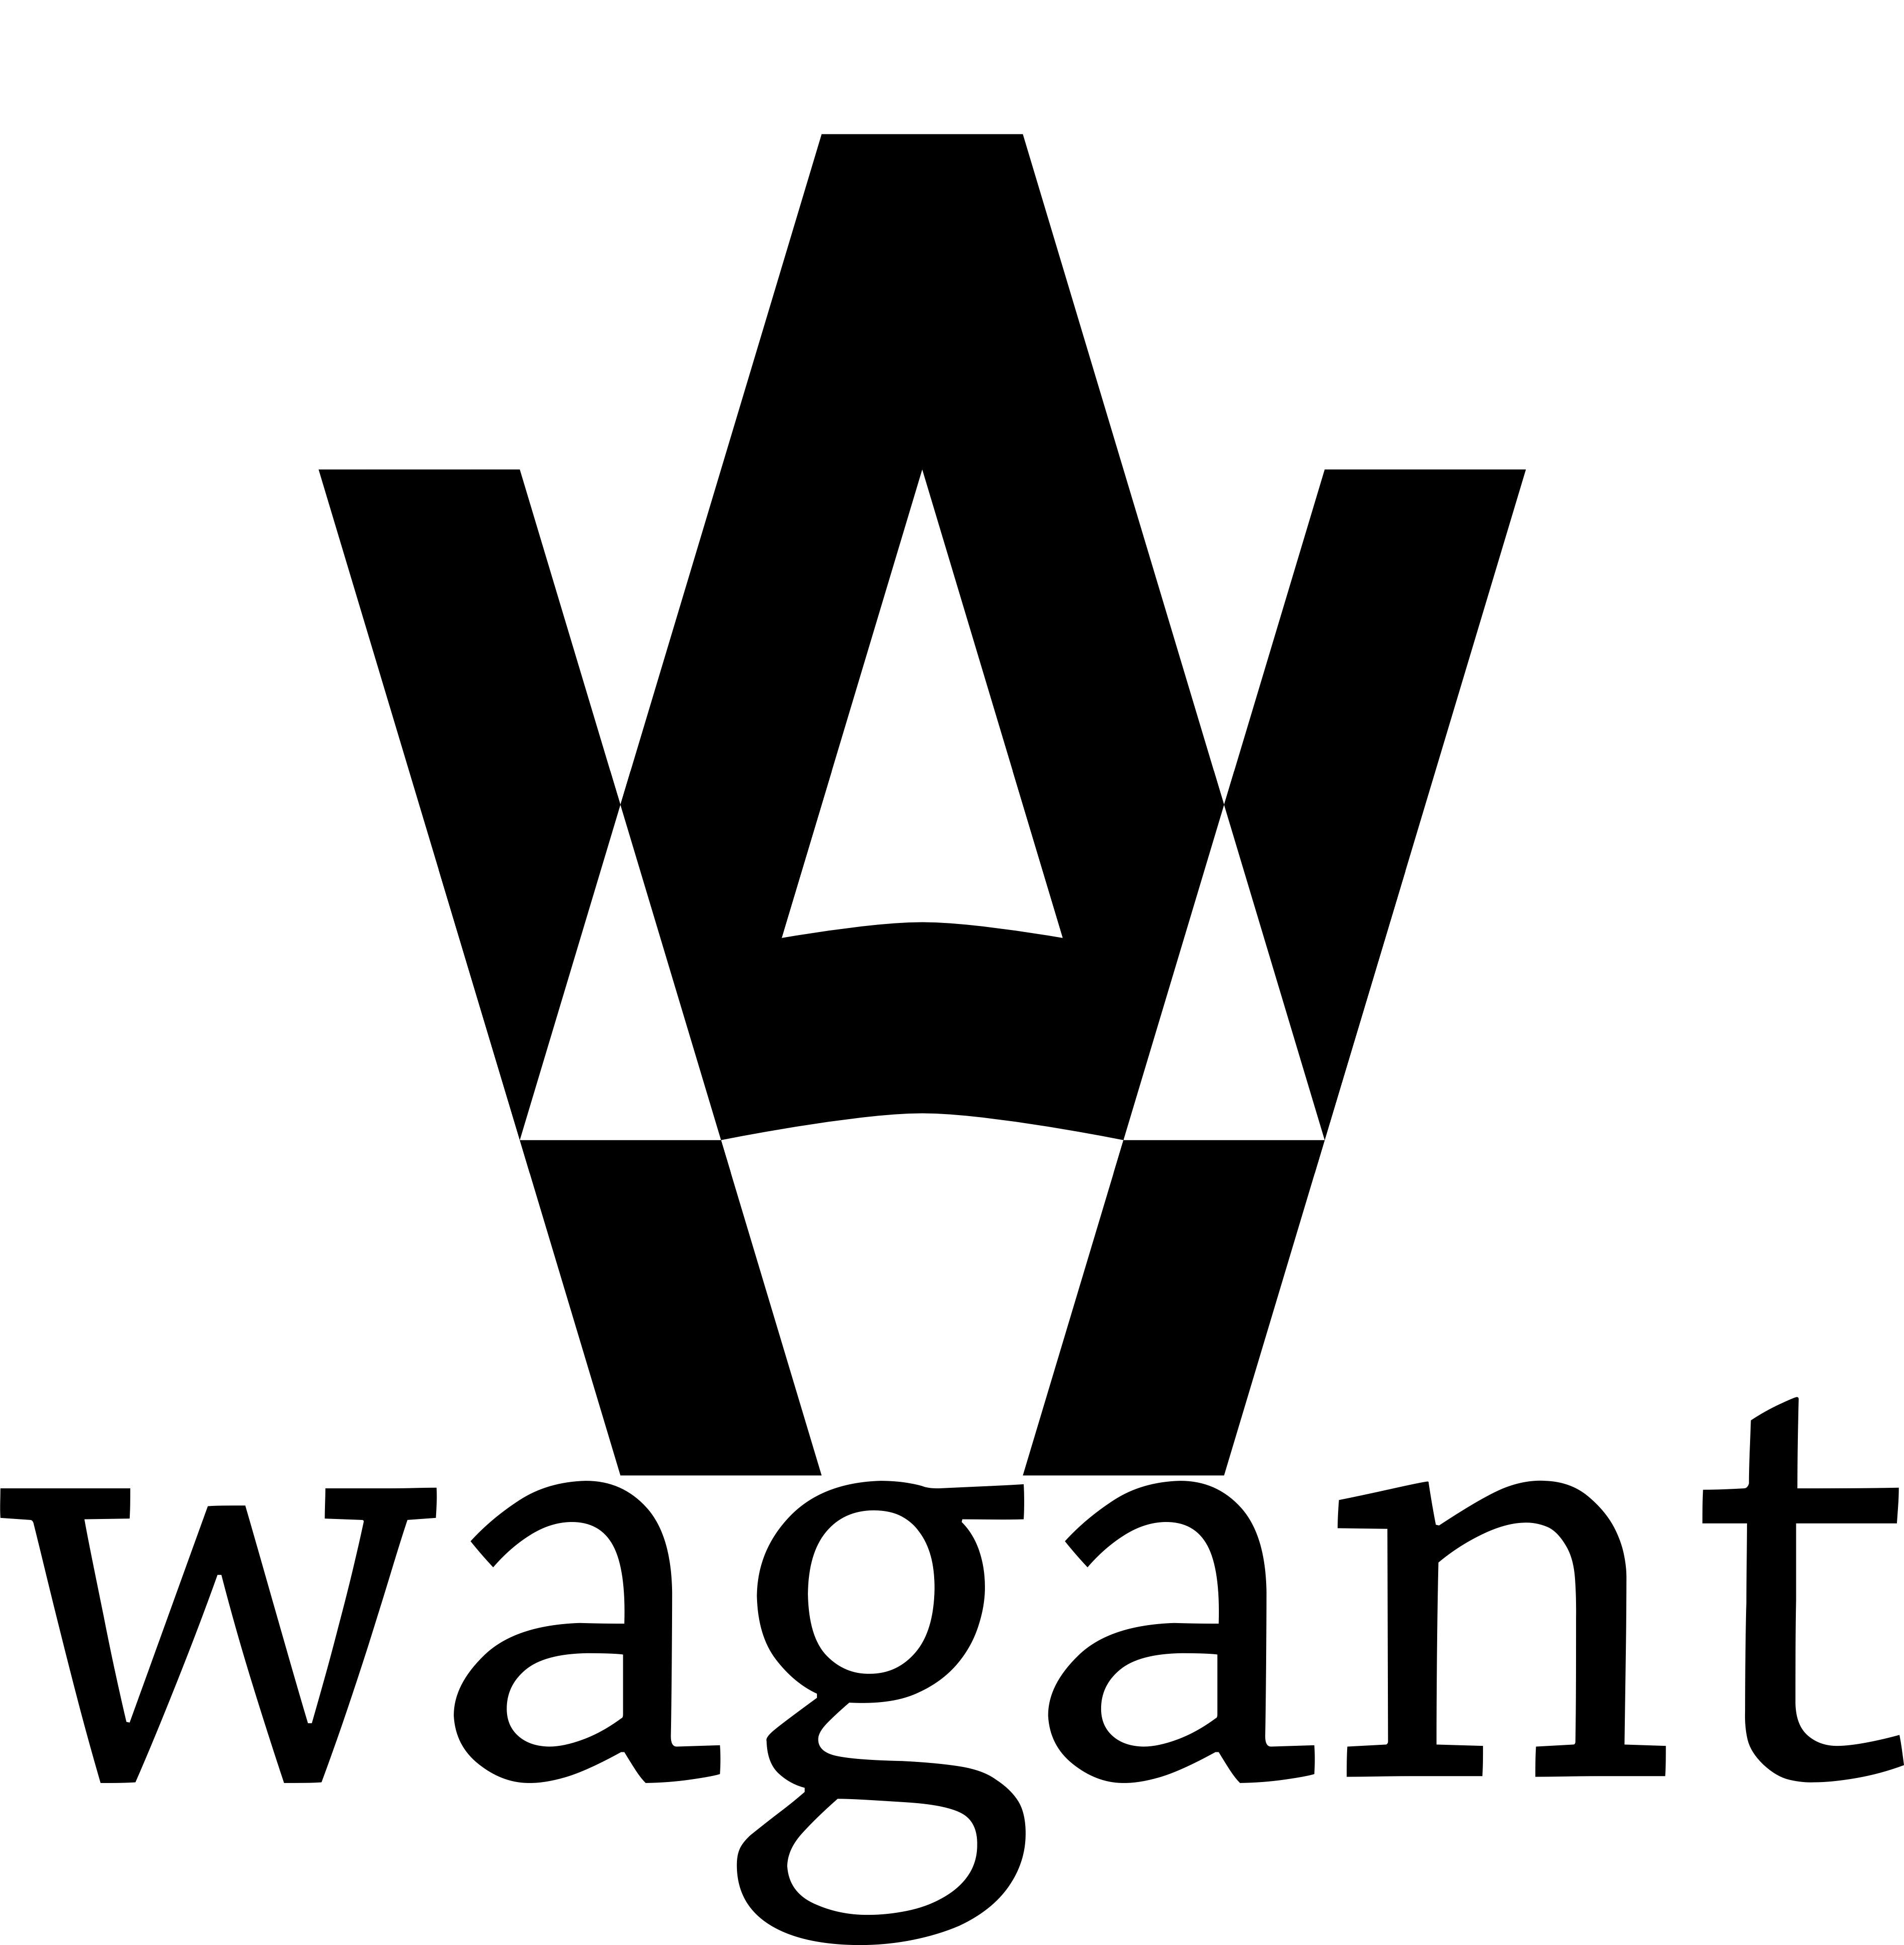 Wydawnictwo WAGANT